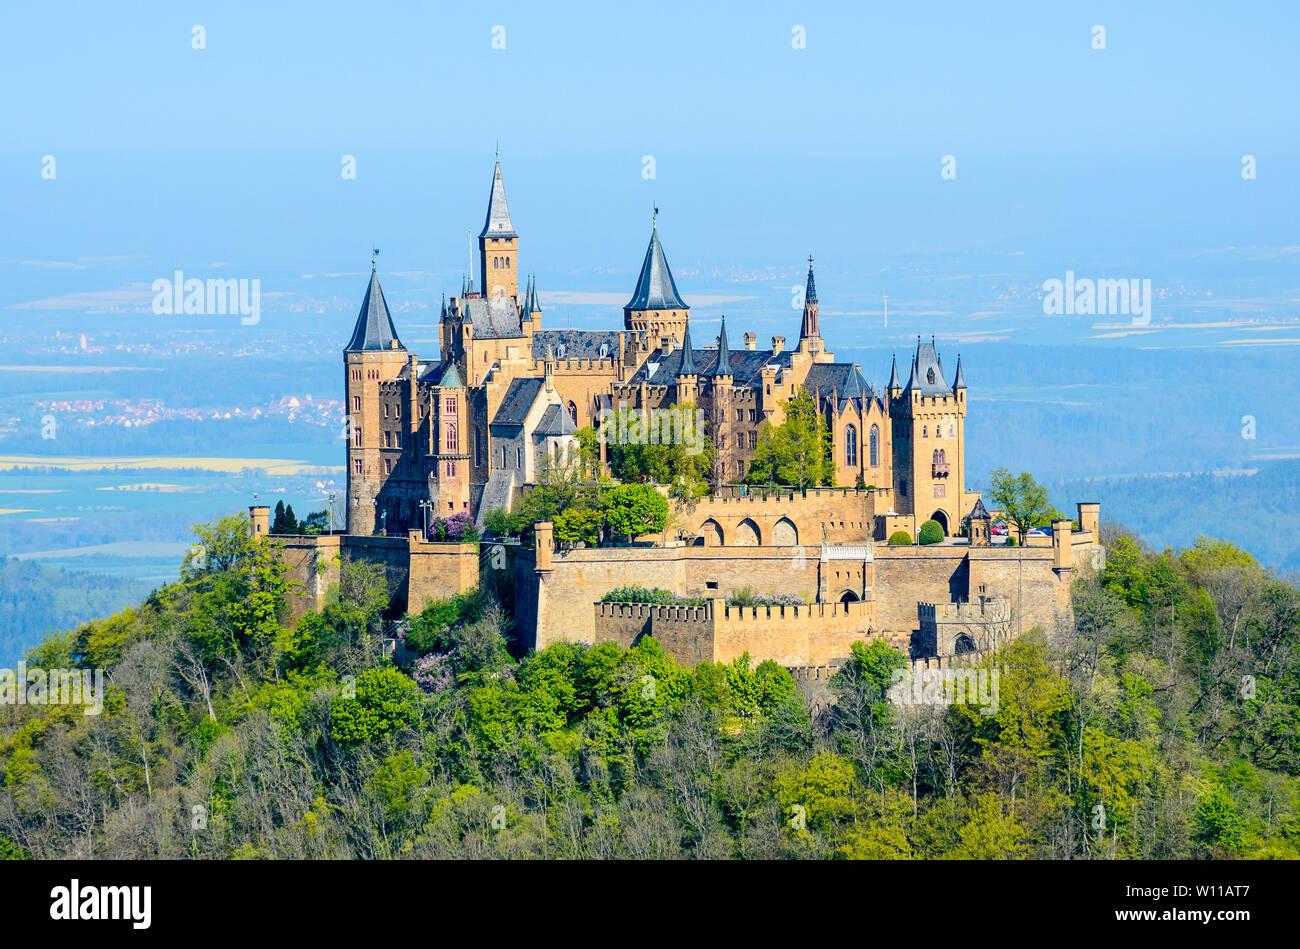 Castle Burg Hohenzollern By Hechingen Near Stuttgart Postcard View Baden Wurttenberg Germany Stock Photo Alamy